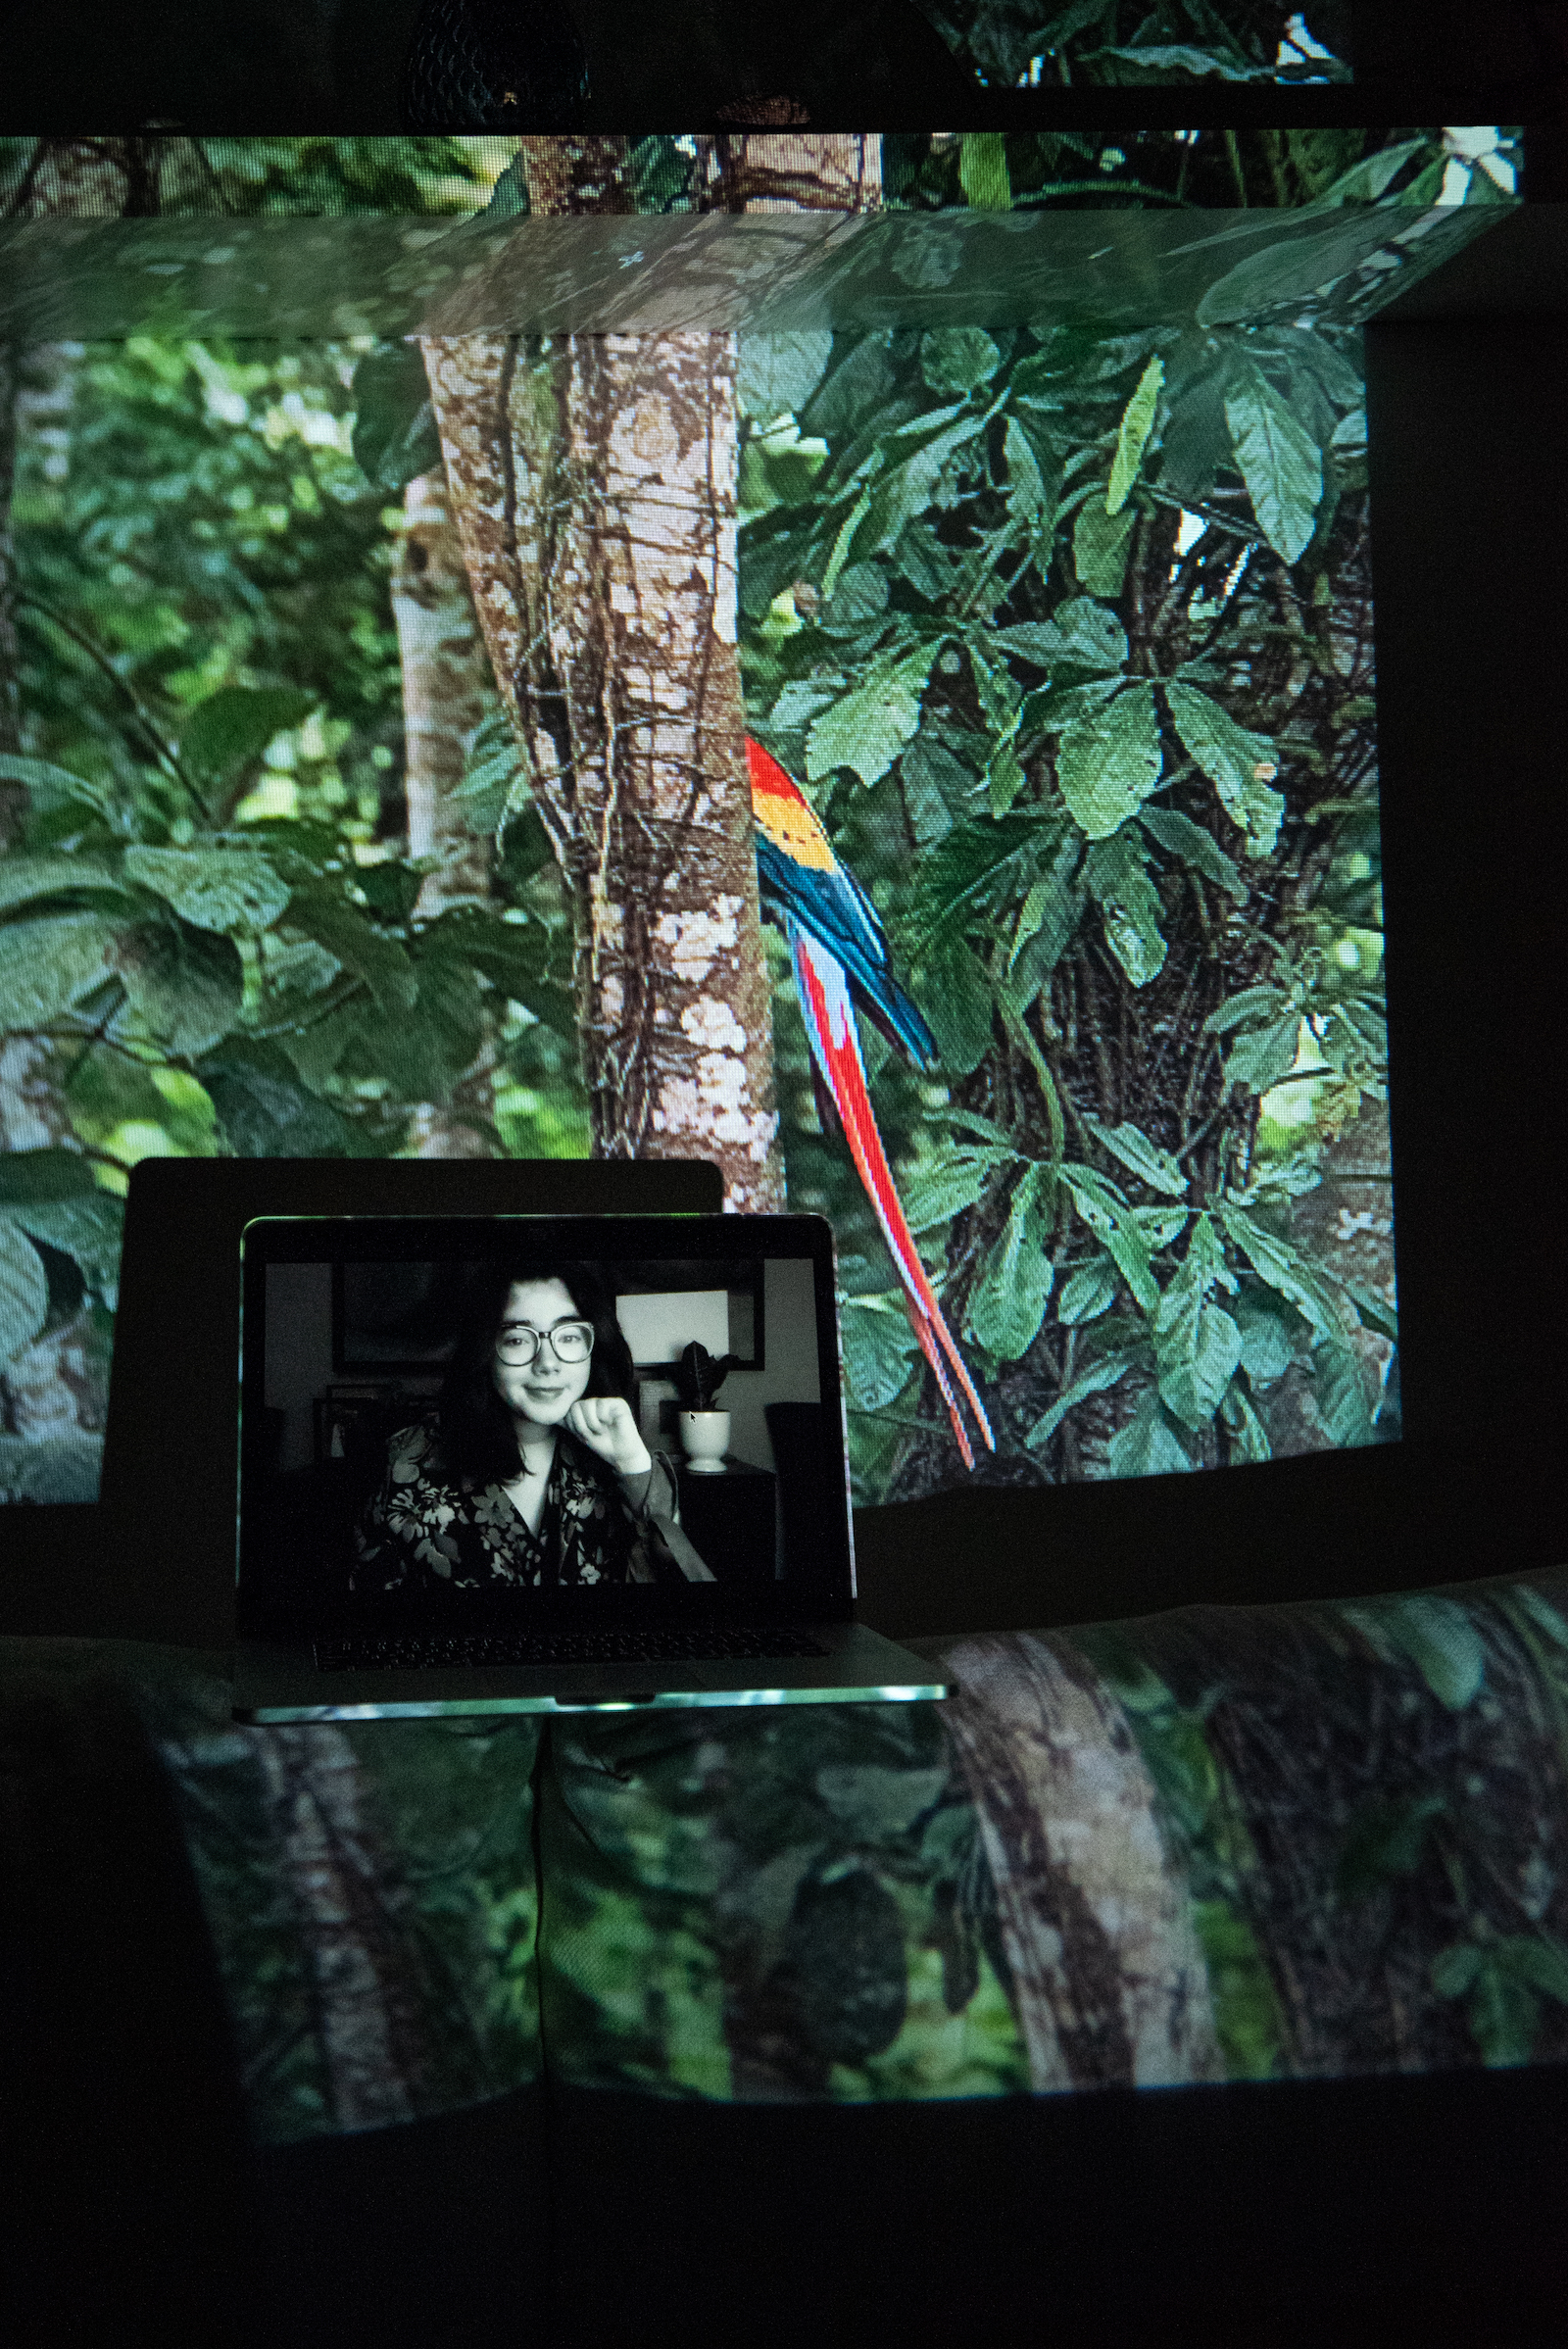 Andrea Villareal, Girl Up Campaign Regional Leader of Latinamerica and the Caribbean,  #EscazúAhora Mexico Co-Founder. Projected Image: La Guacamaya, Lacandon Jungle, Mexico, December 2020.